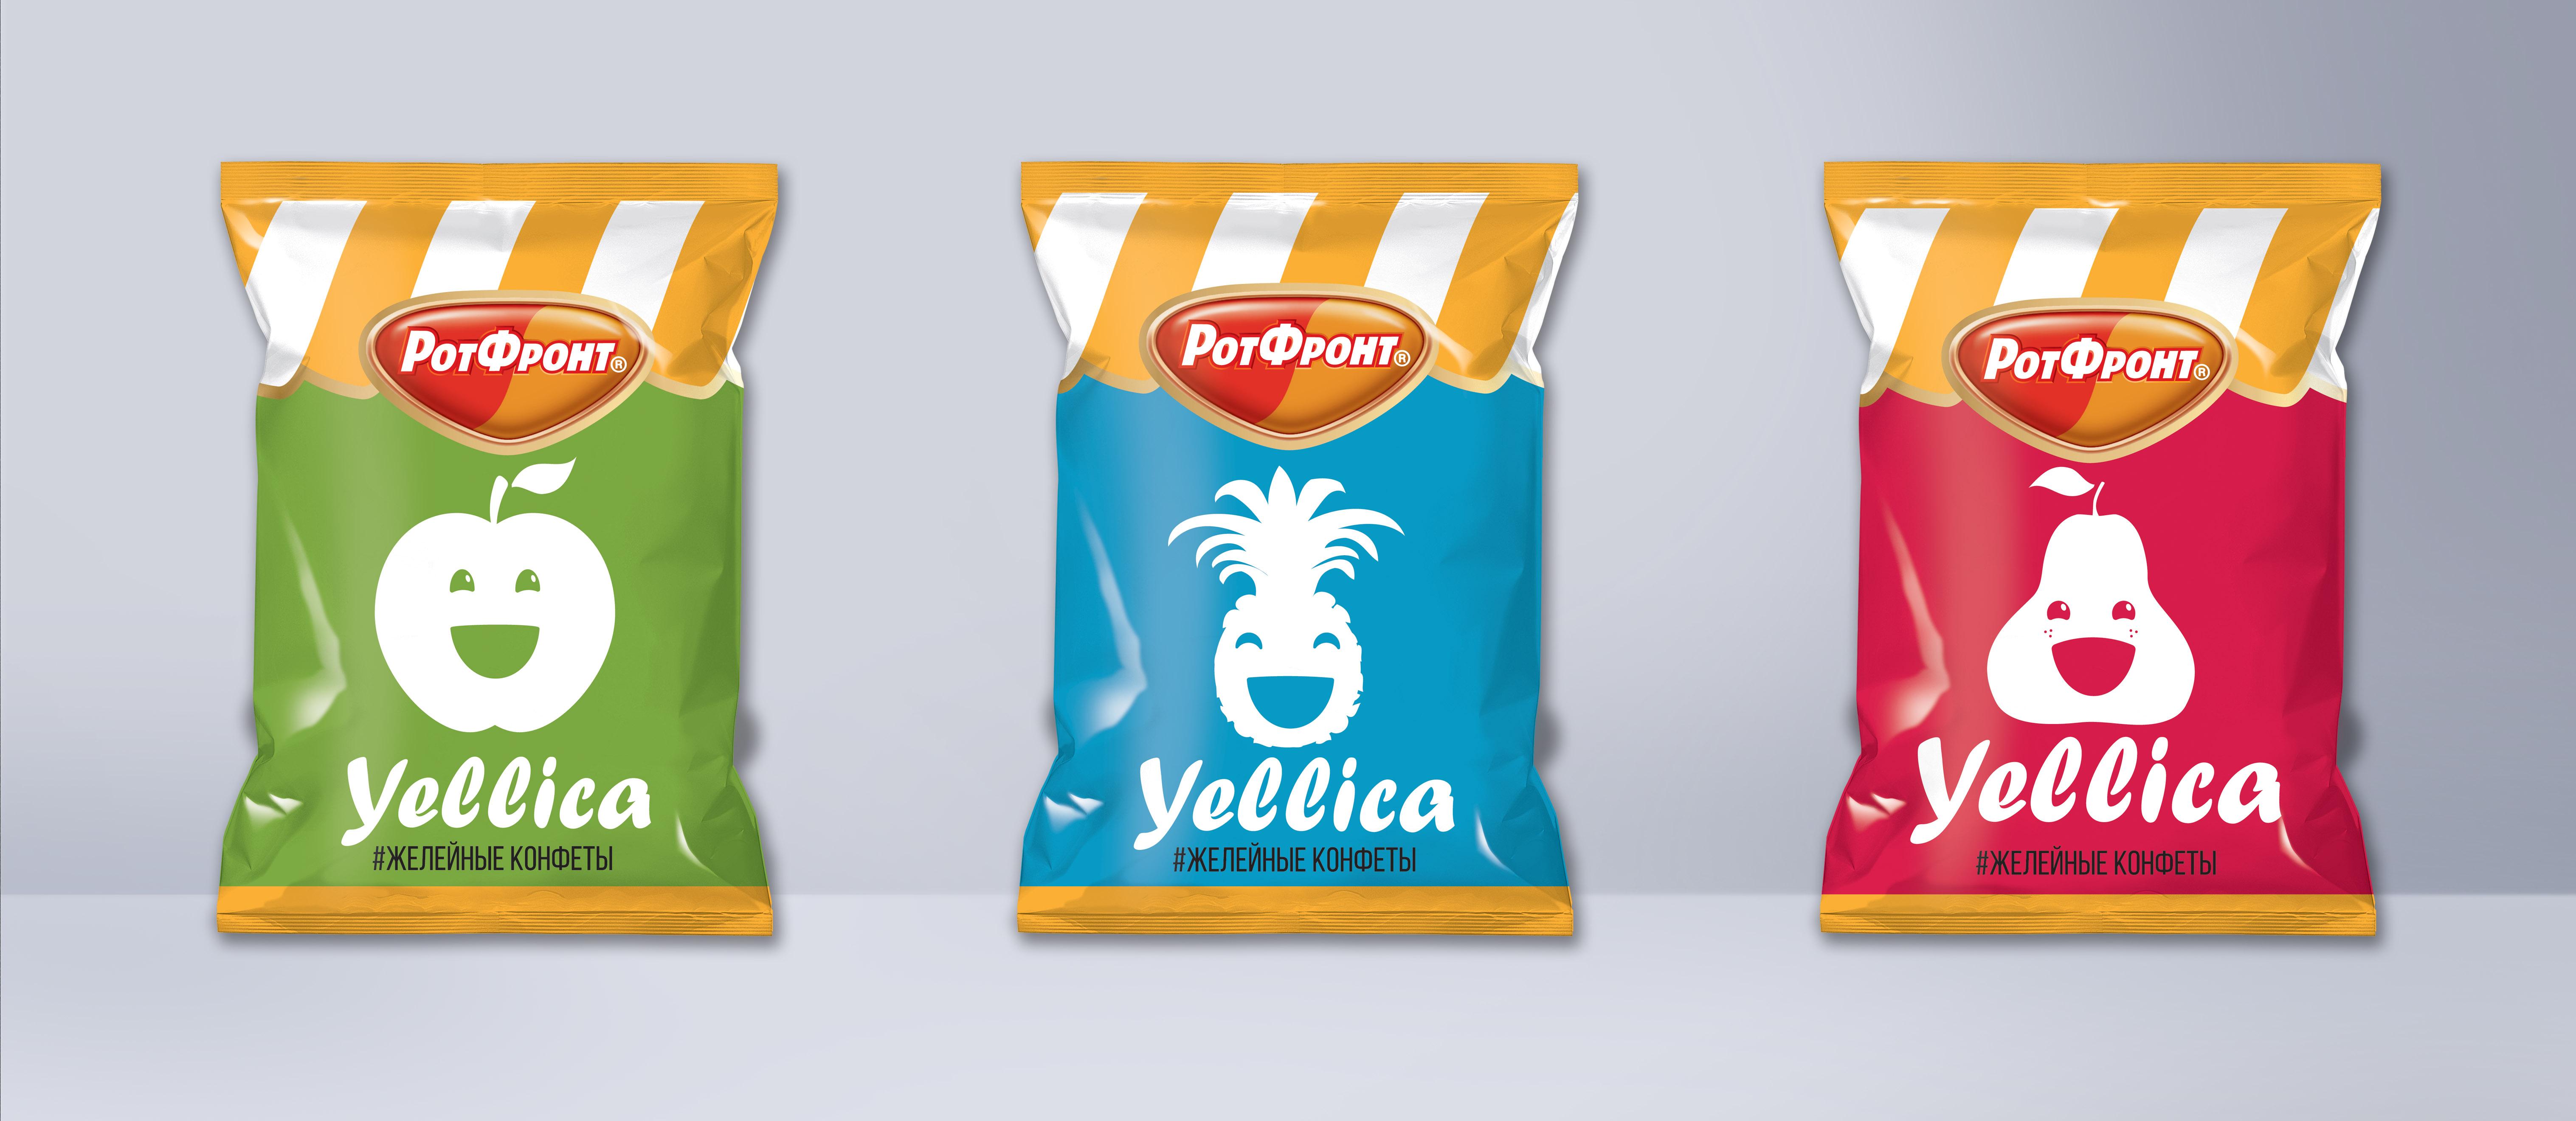 Разработка дизайна упаковки для желейных конфет от Рот Фронт фото f_6605a57e4439439a.jpg